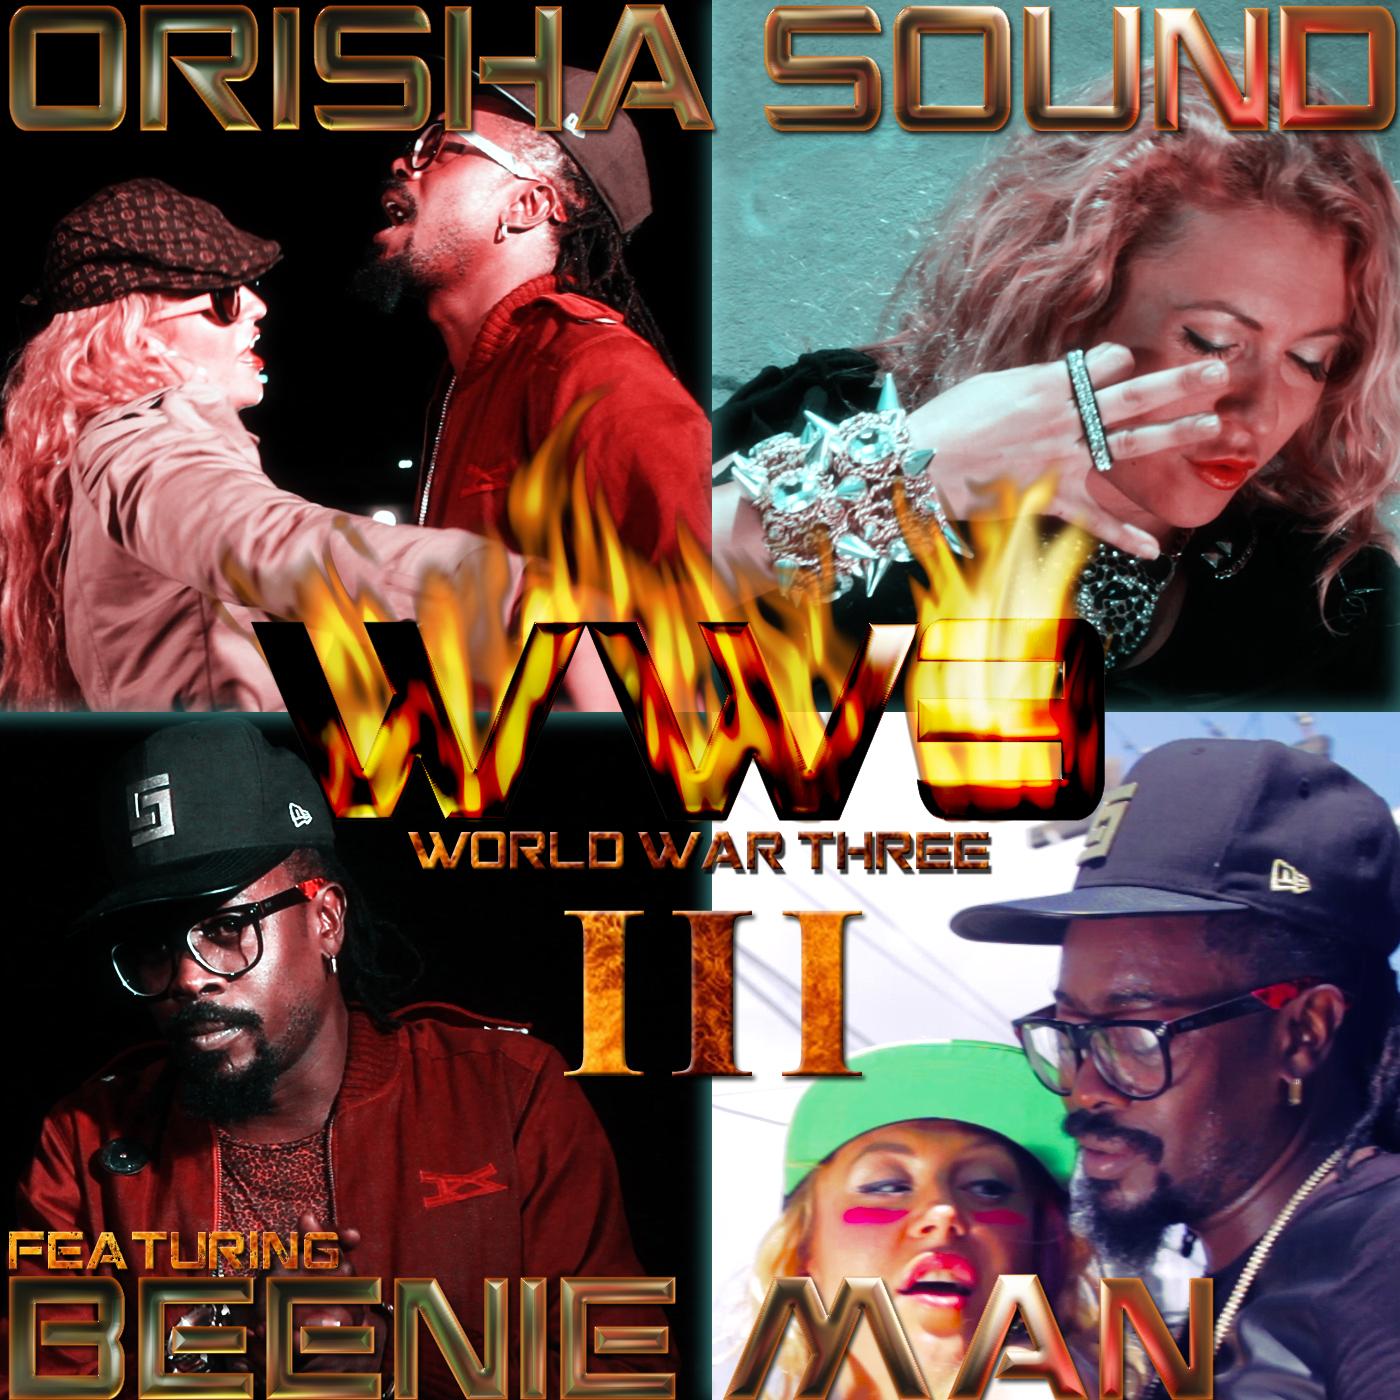 ORISHA-SOUND-FT-BEENIE-MAN-WORLD-WAR-3-COVER